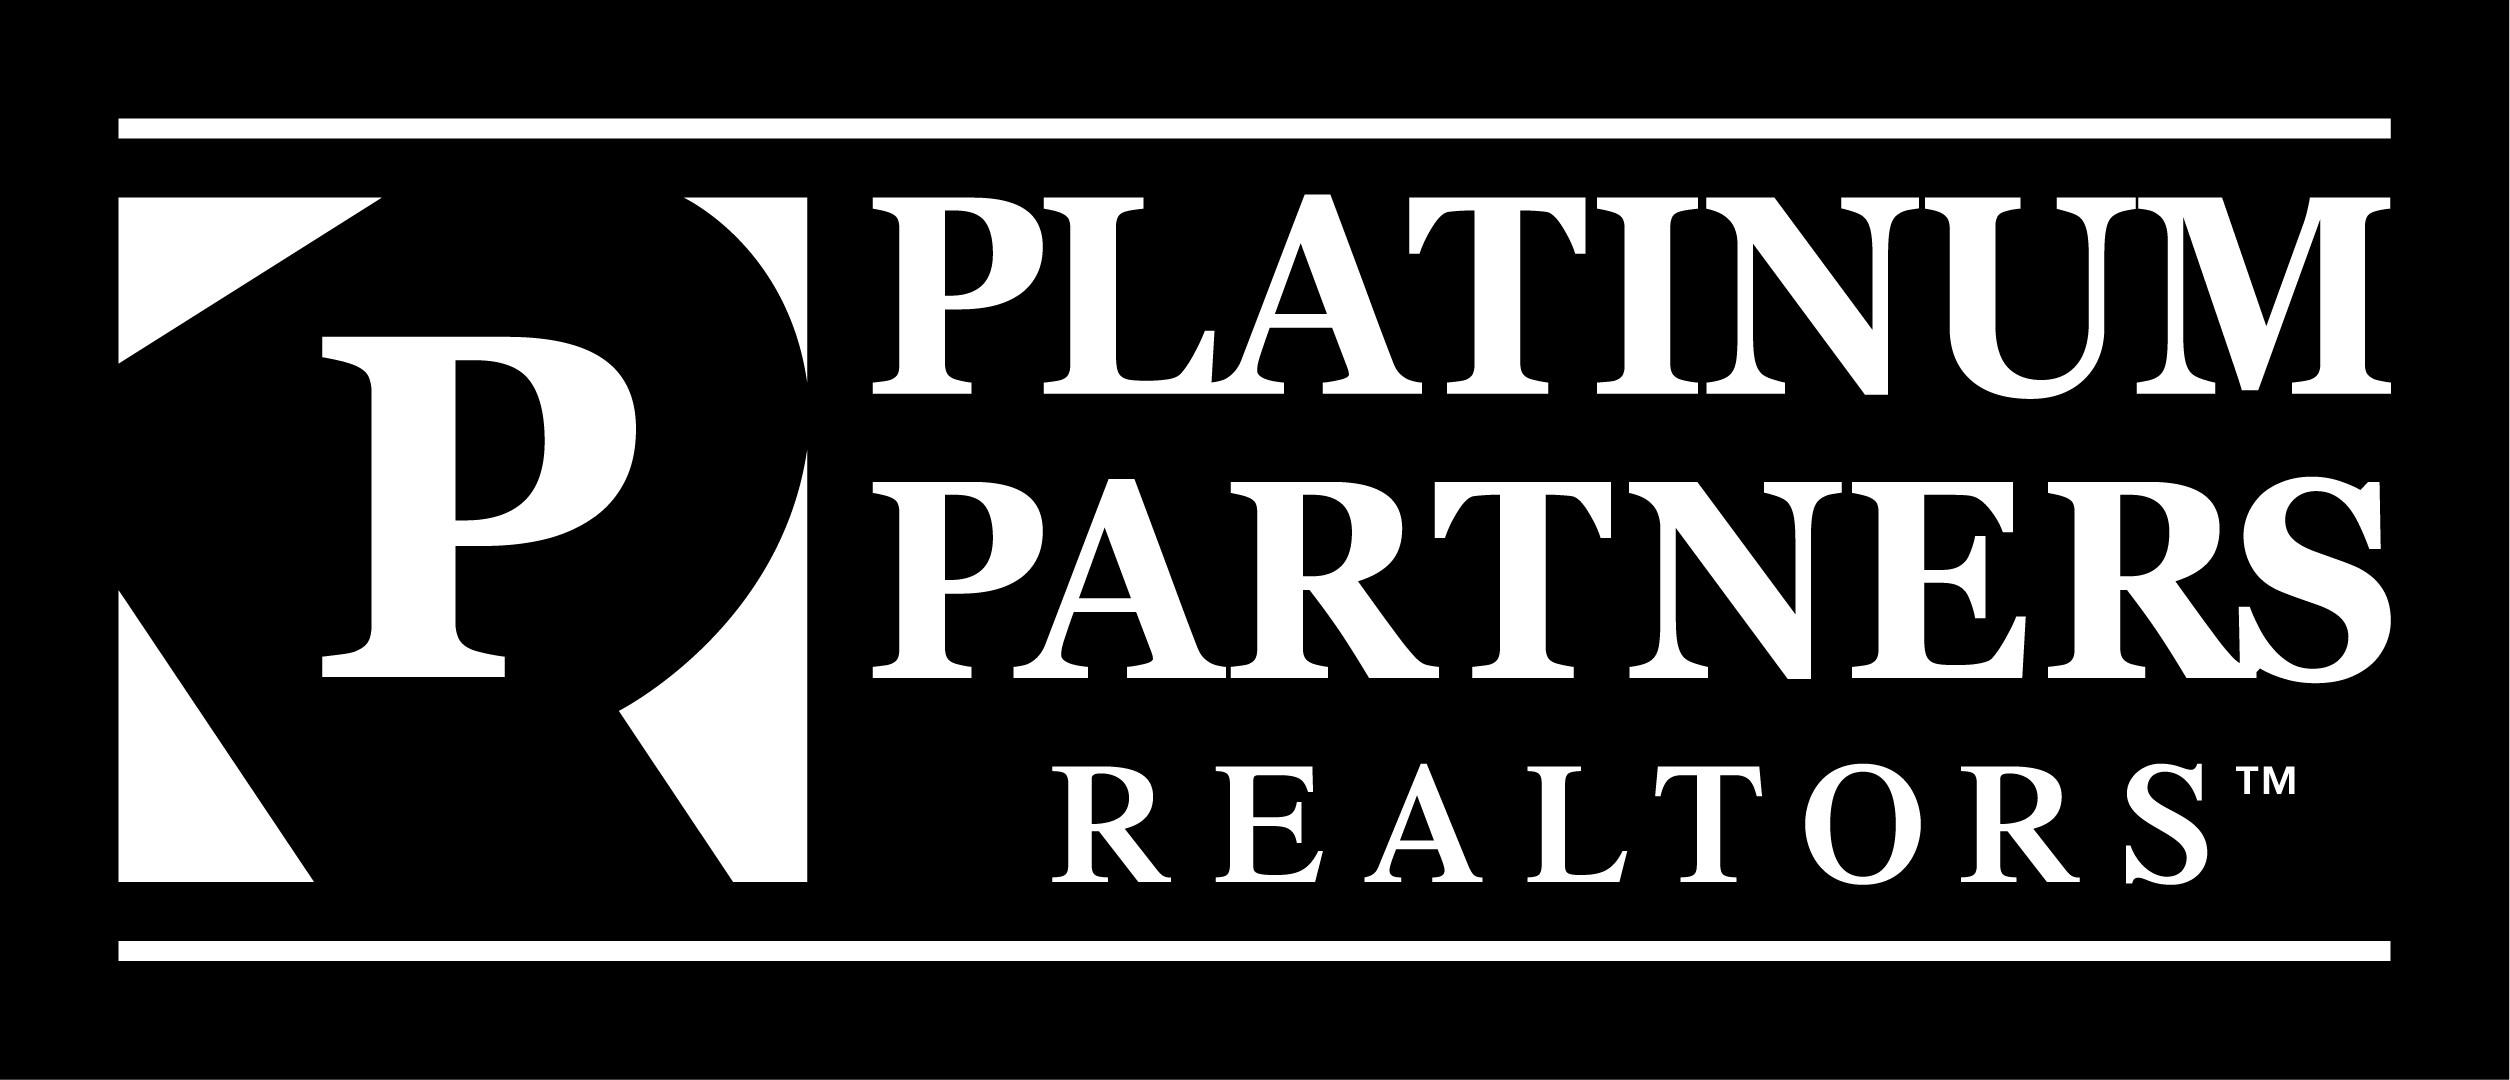 PLATINUM PARTNER REALTORS